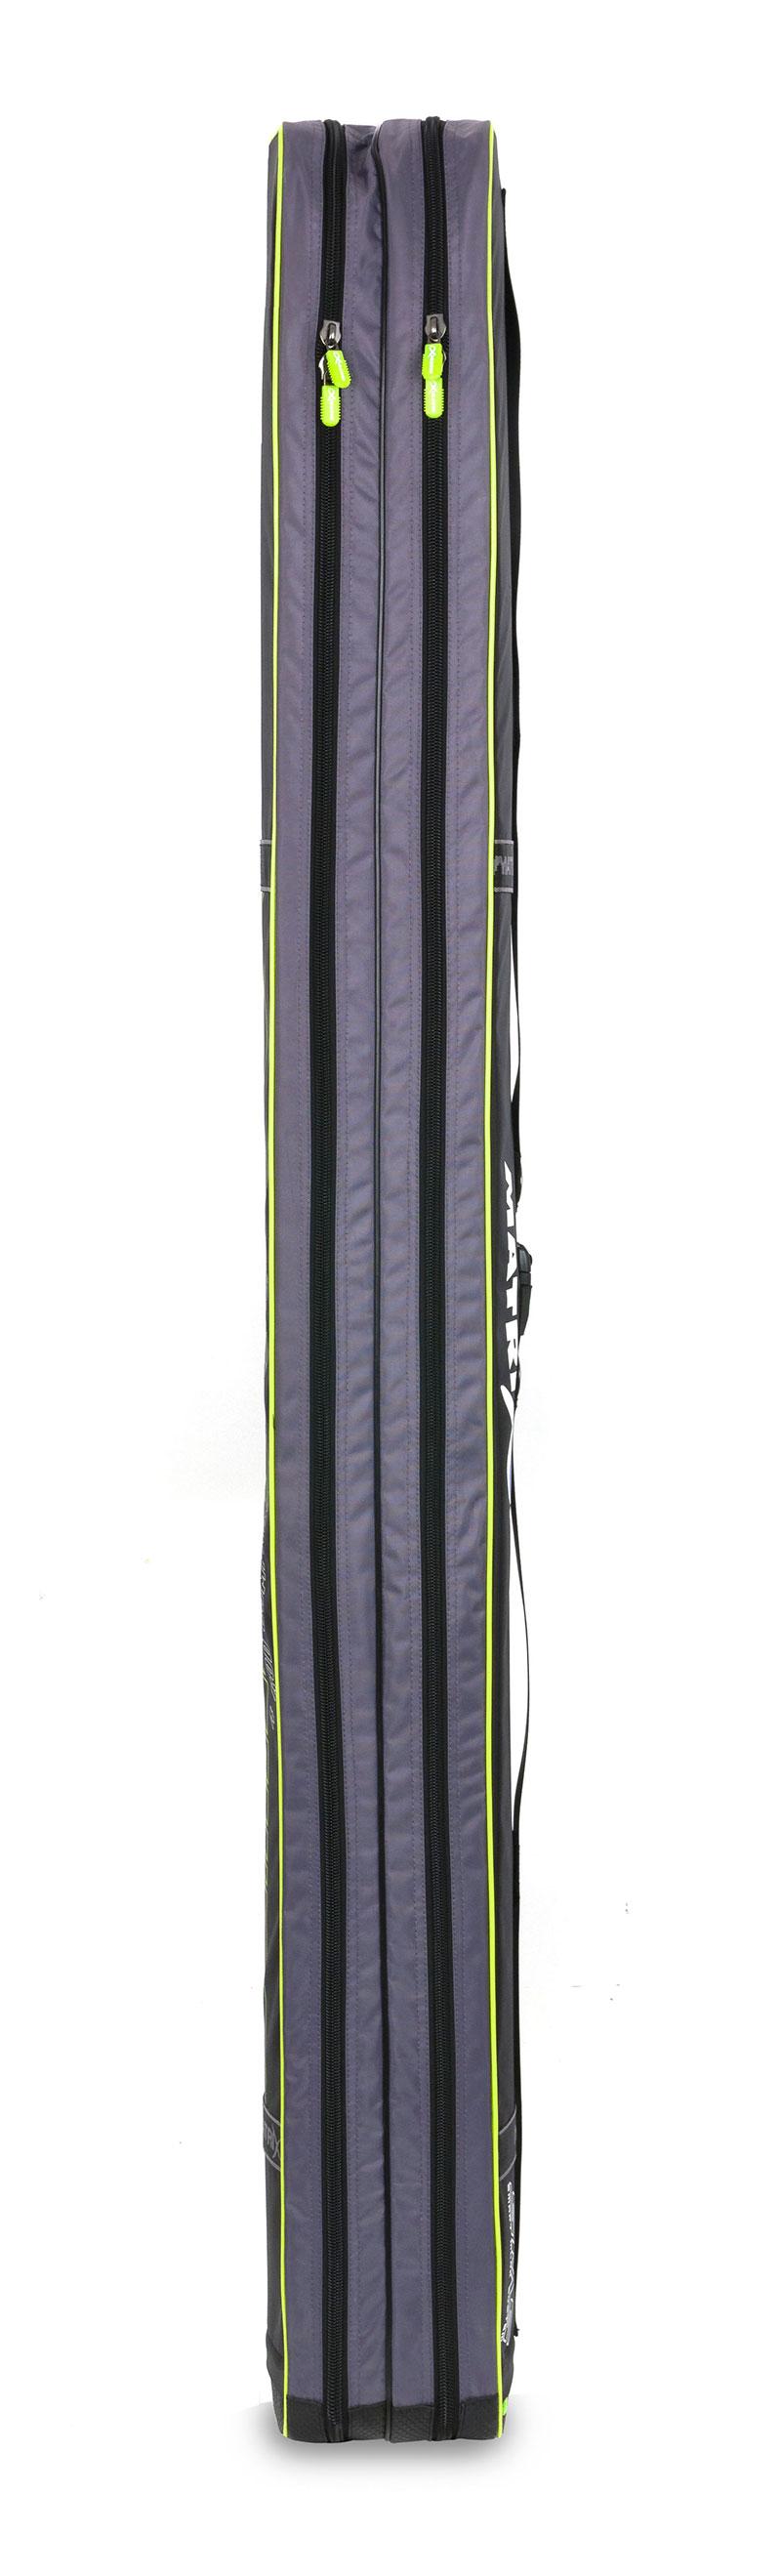 glu092-093-ethos-pro-compact-rod-holdall-side-ajpg